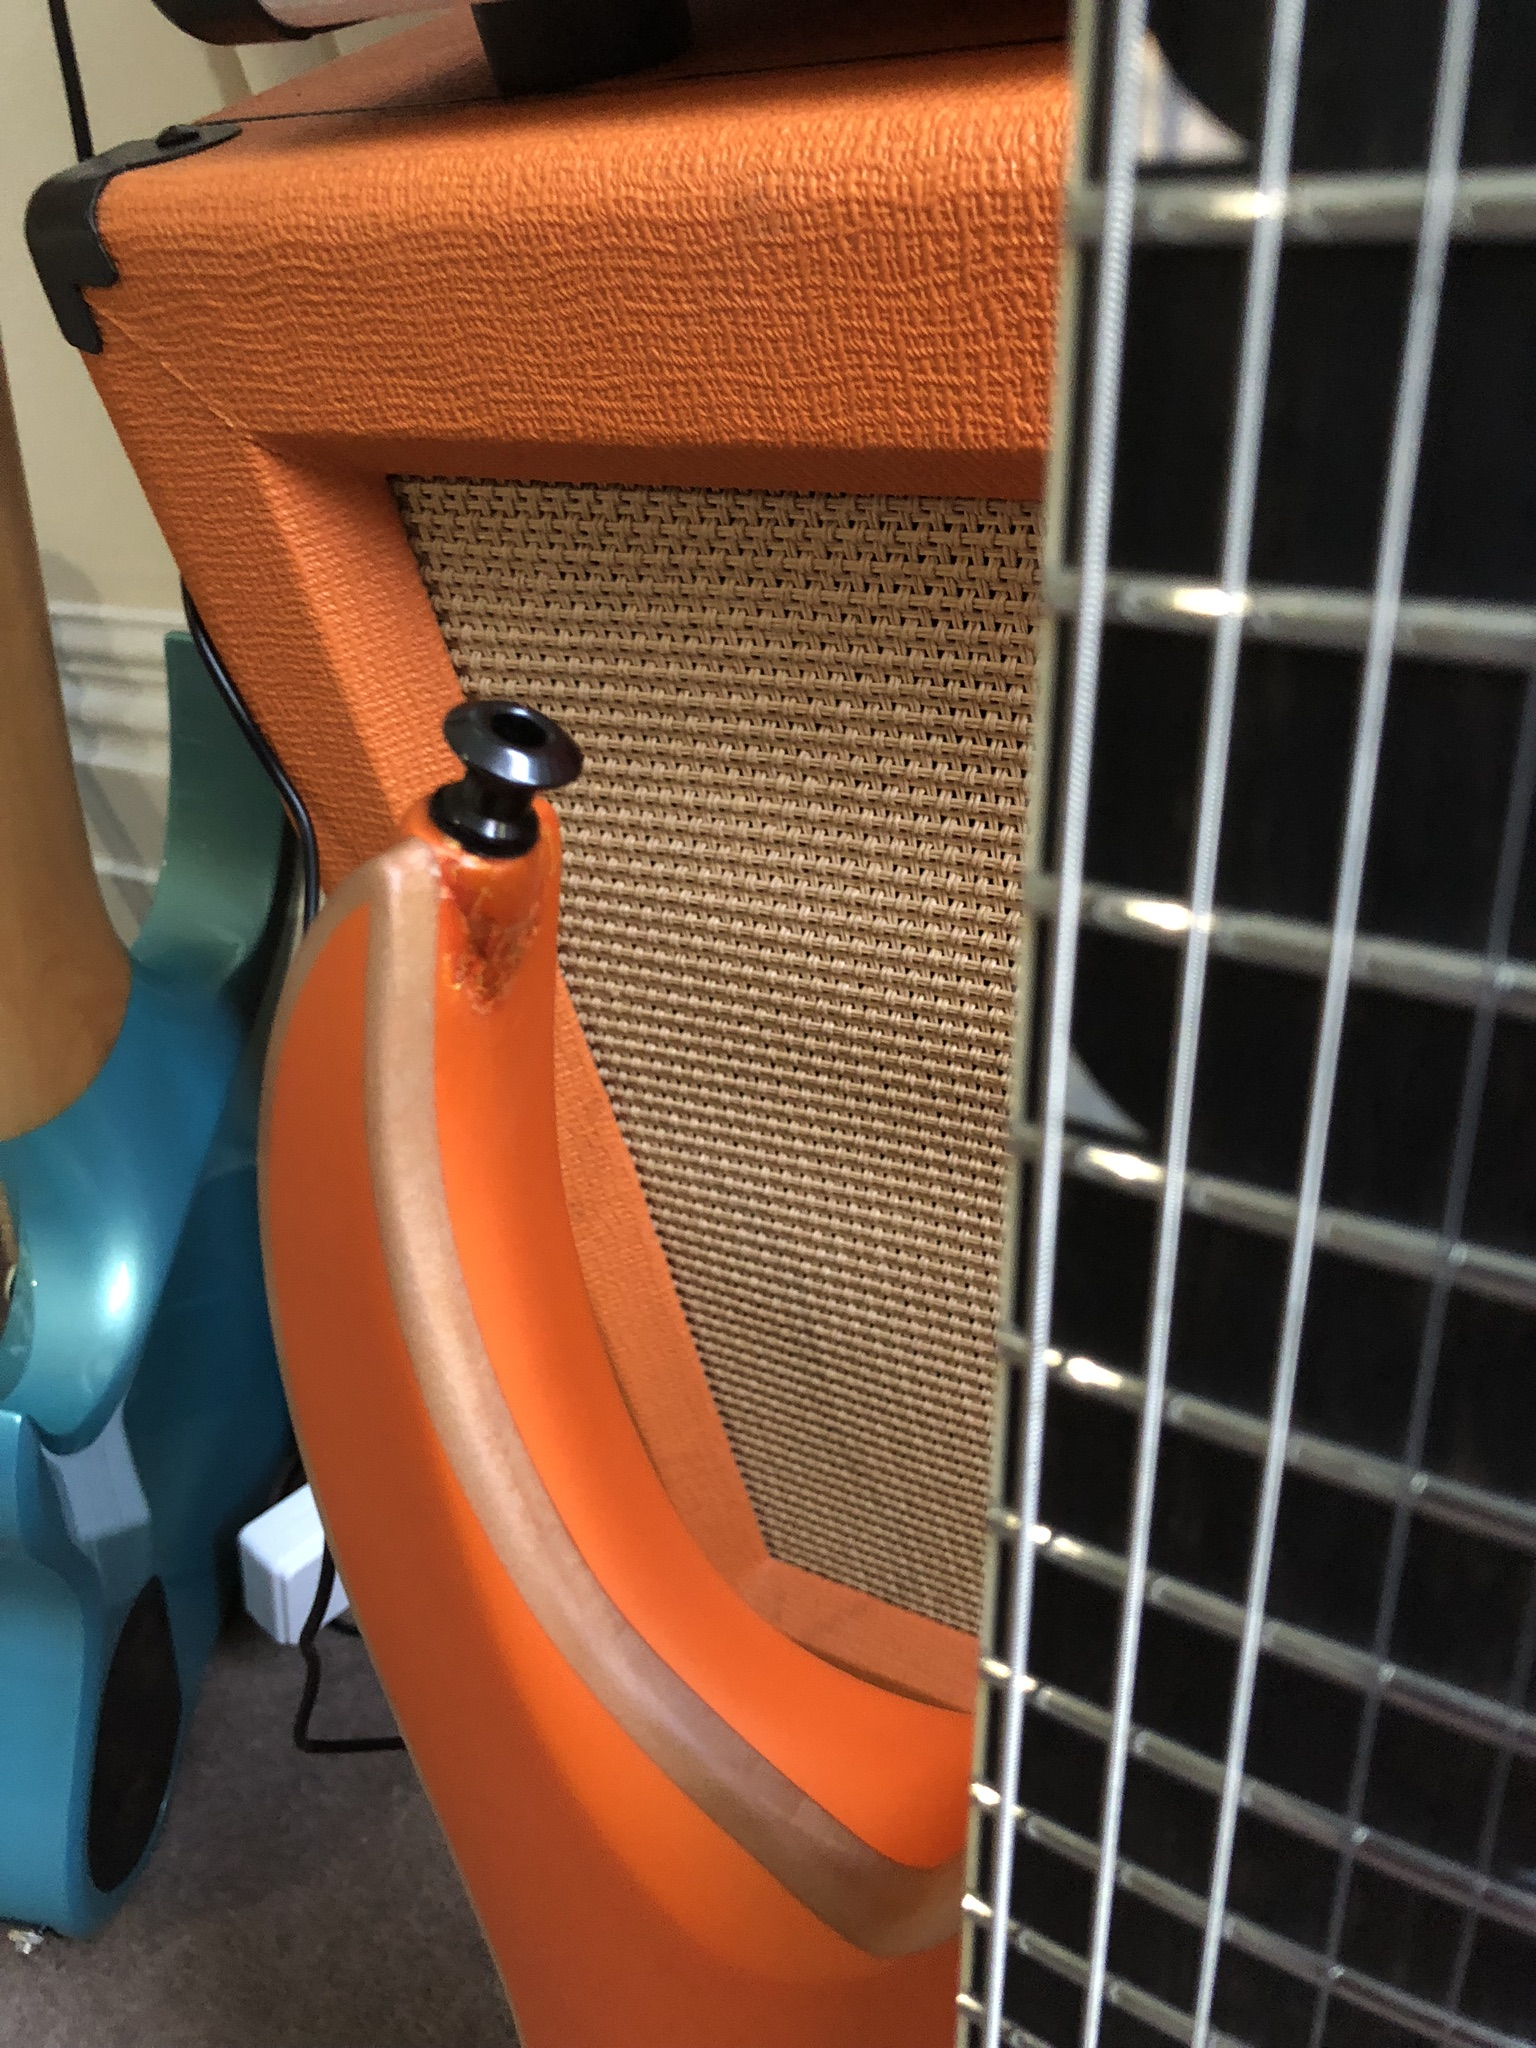 NGD! Jackson USA Juggernaut HT6 in matte lambo orange (backstory included)-27ca1c64-0b1f-4e16-b581-2276b0039e14-jpeg